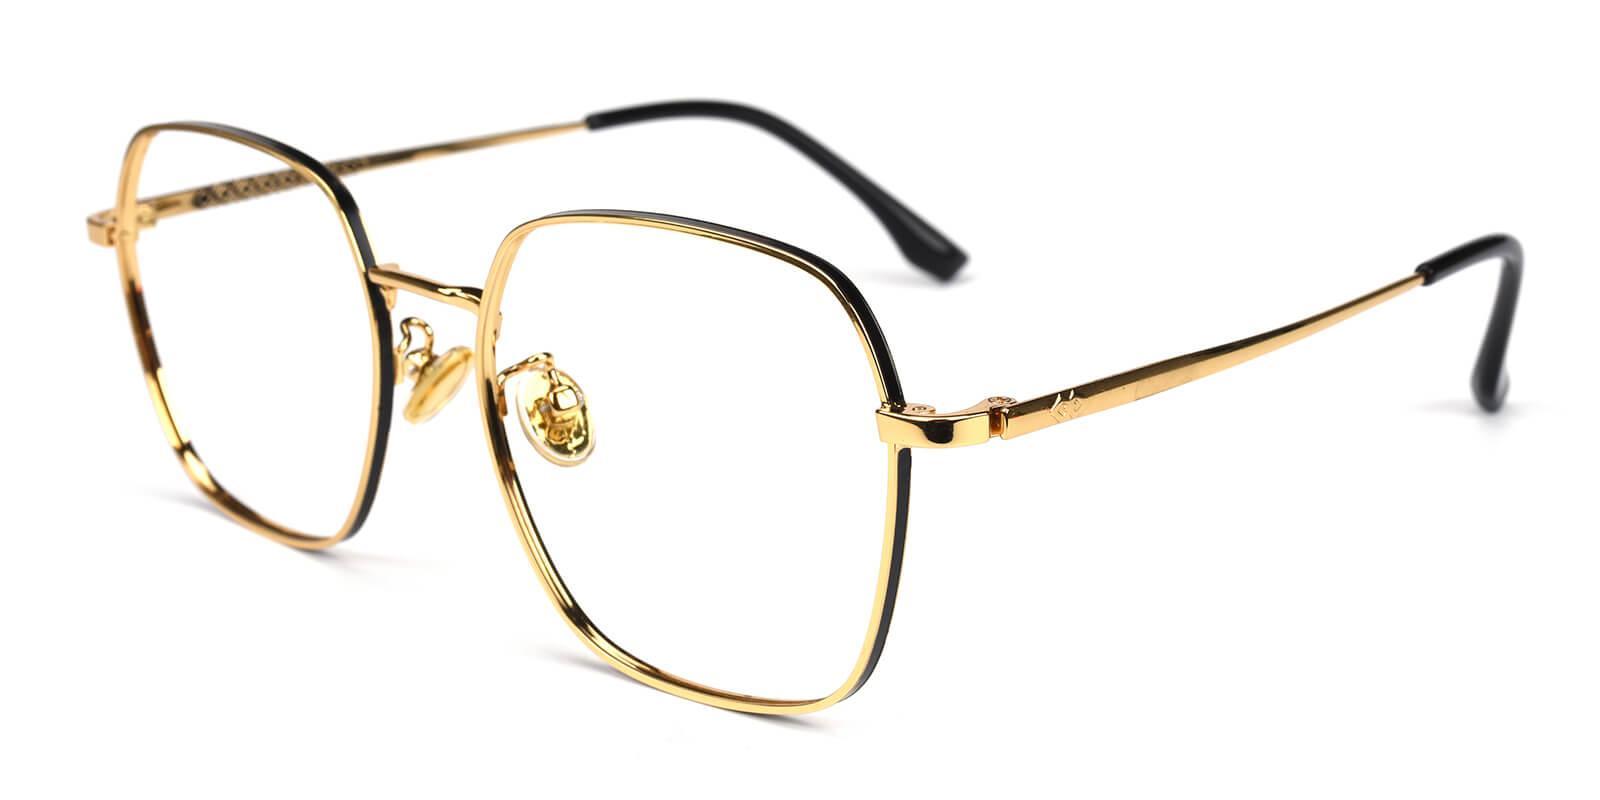 Vincoy-Gold-Square-Metal-Eyeglasses-detail